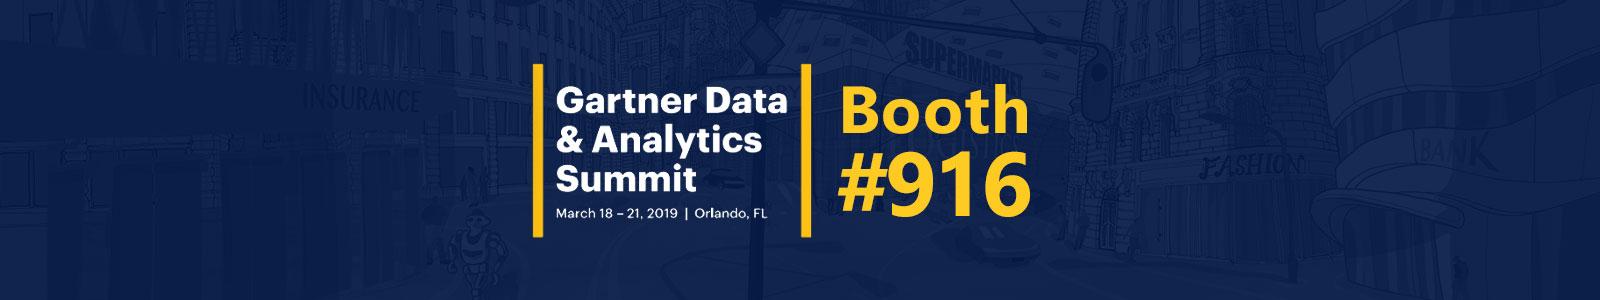 Meet BOARD at the Gartner Data & Analytics Summit